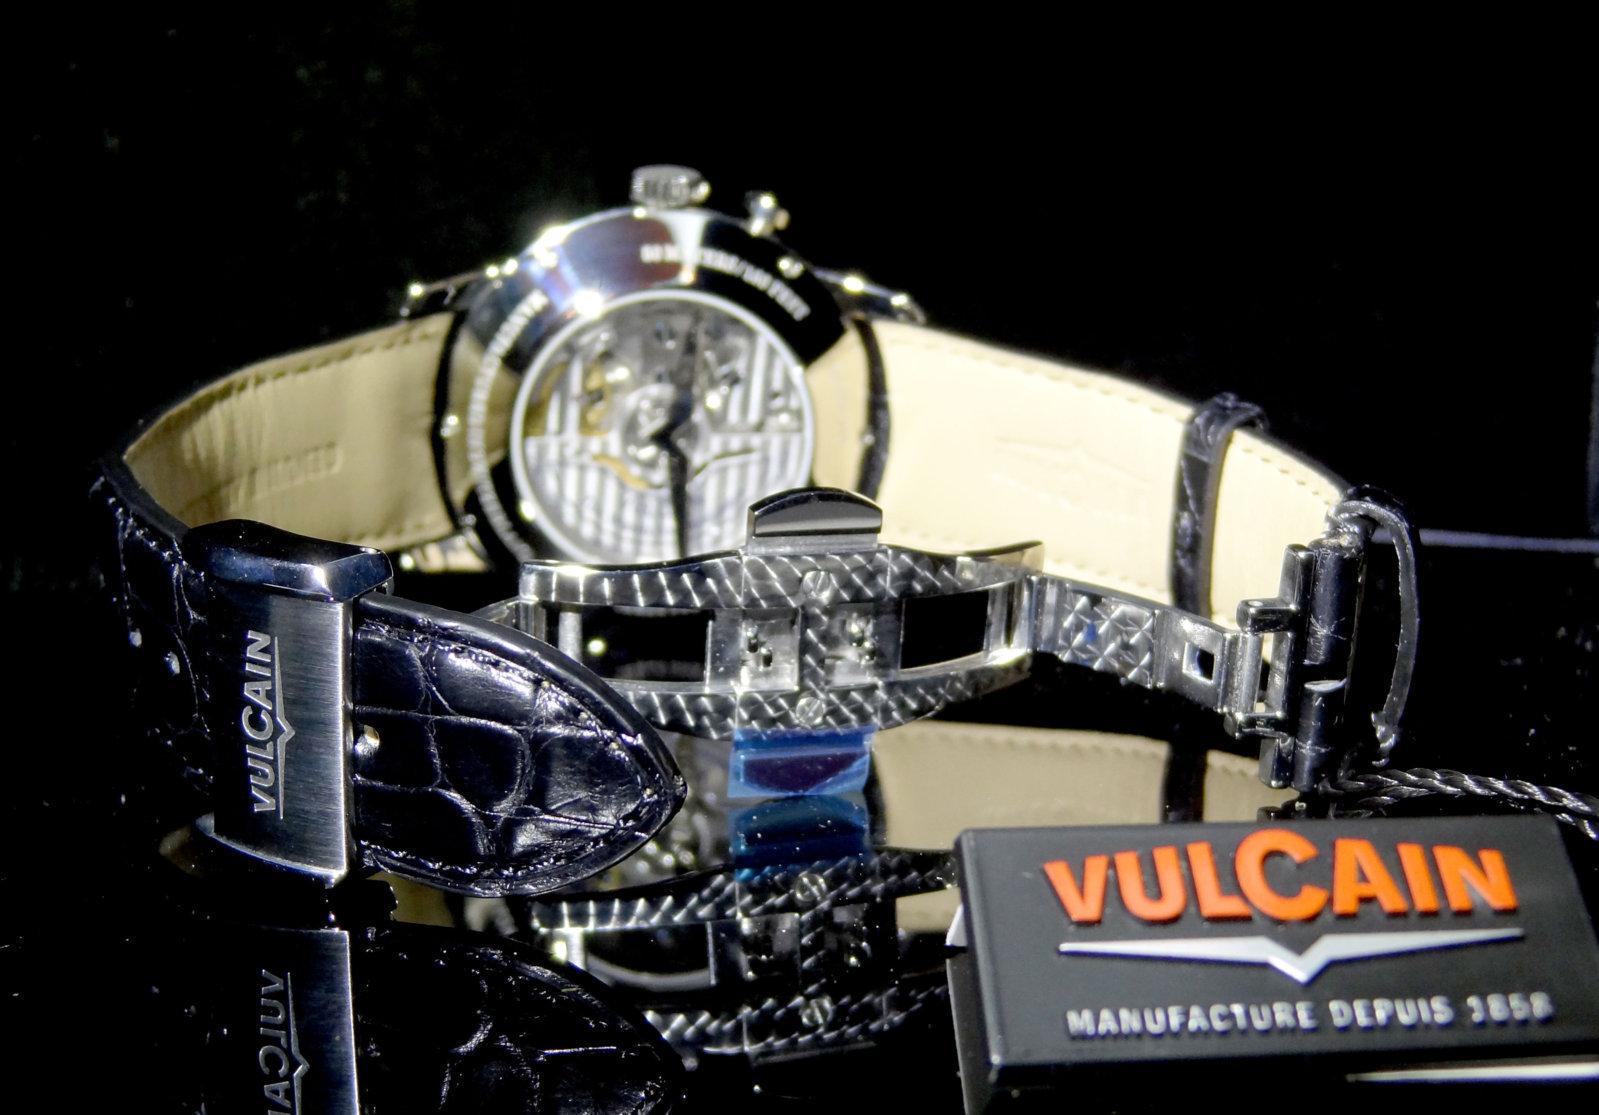 vulcain50ss-8.jpg